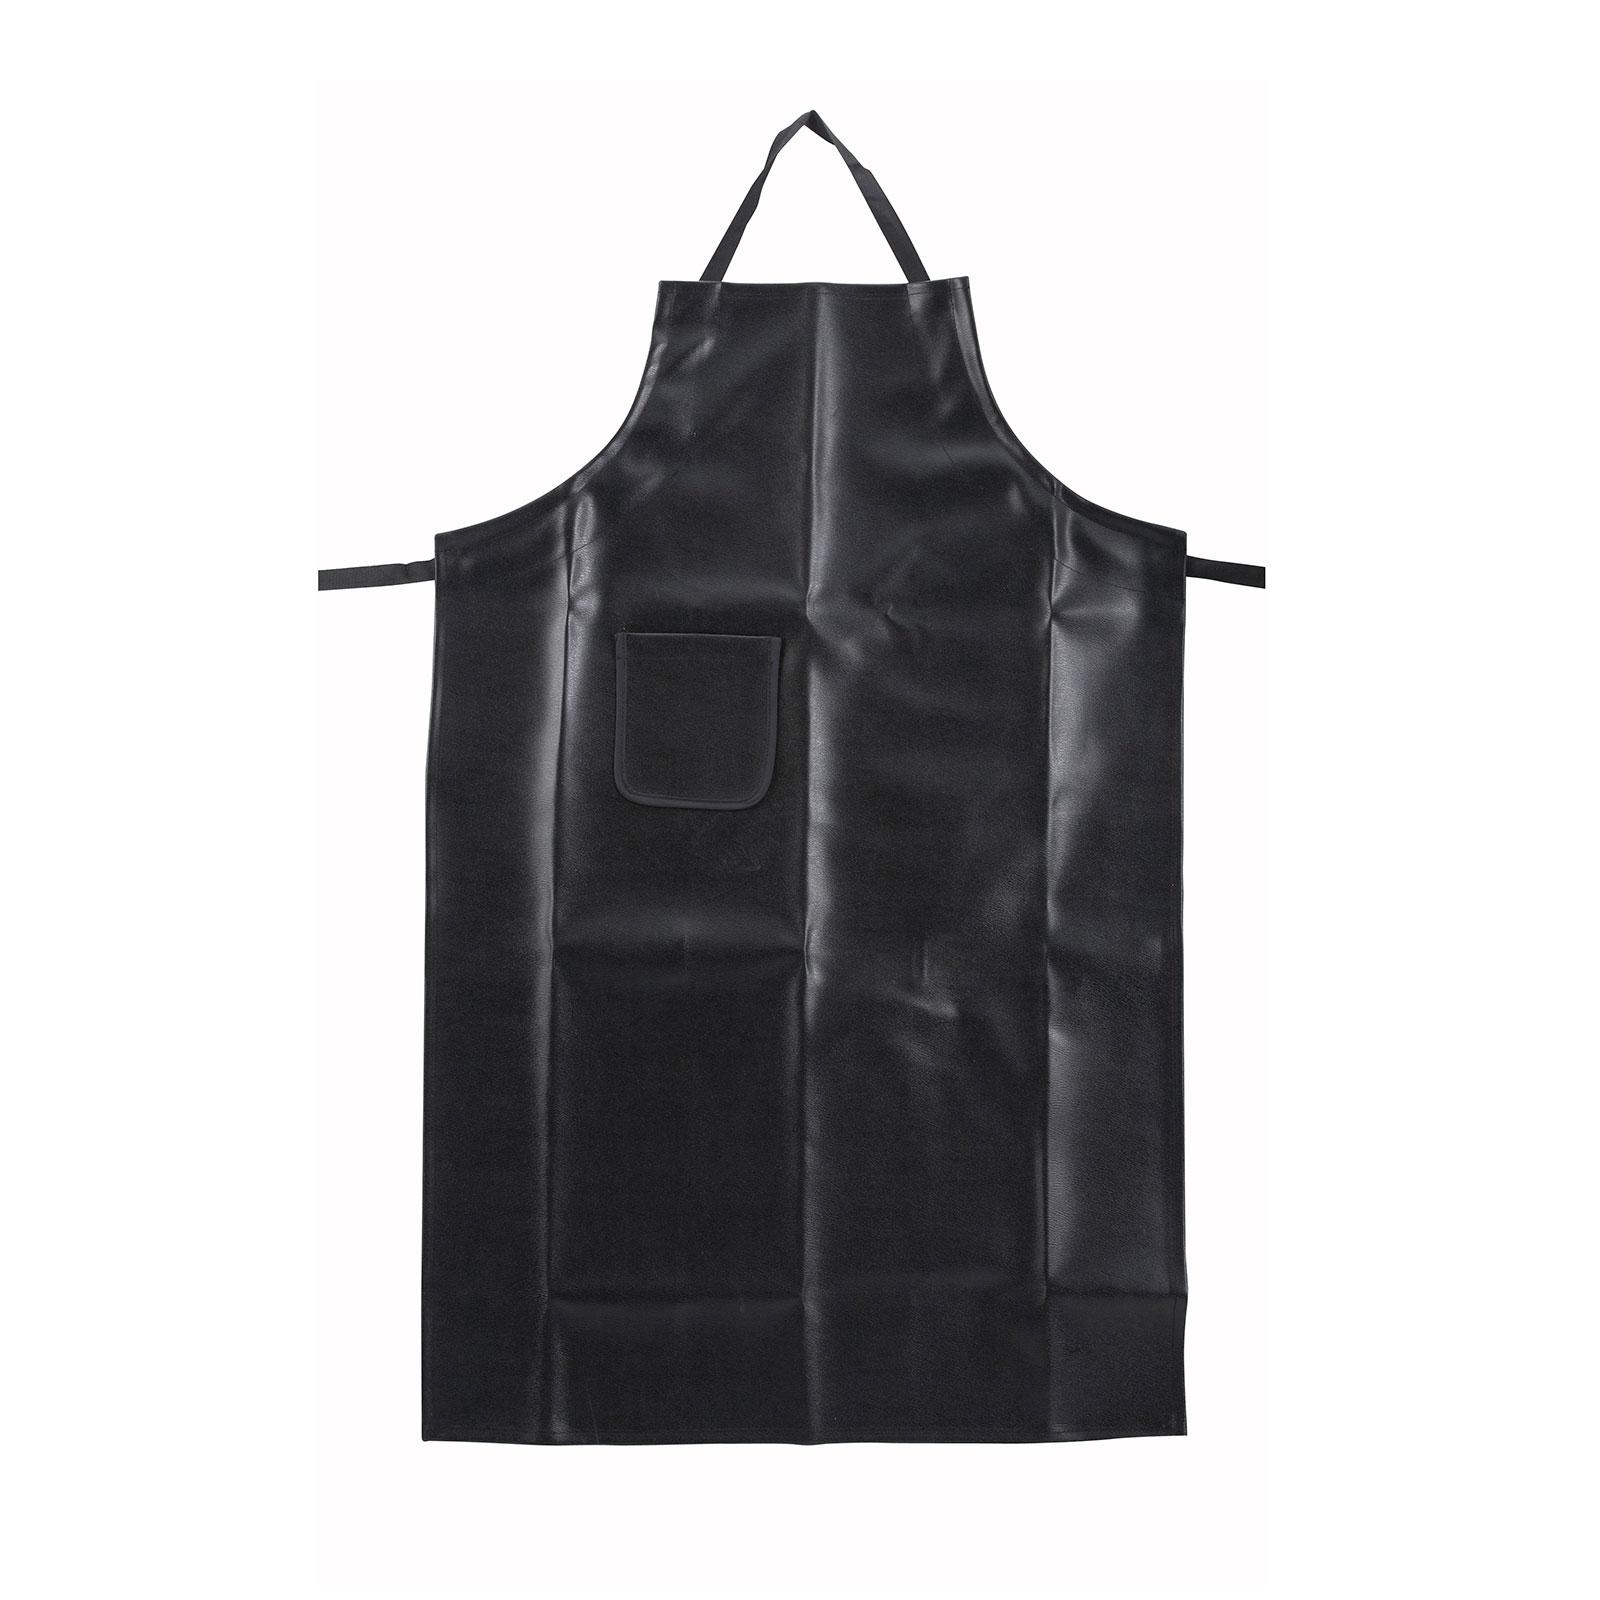 1550-69 Winco BA-HN bib apron